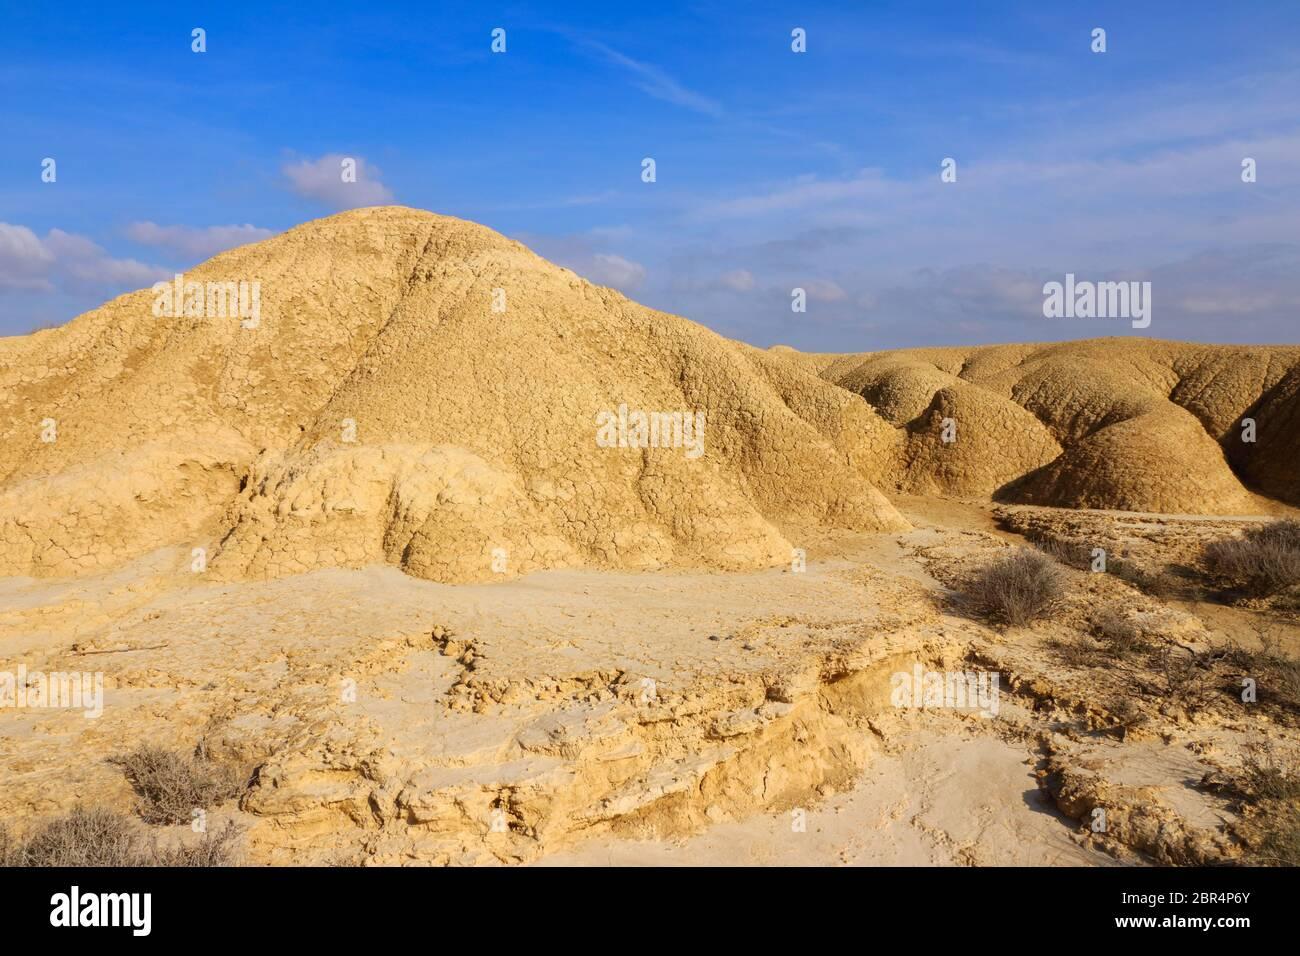 Striking landforms with distinct desiccation cracks in the semi-desert natural region Bardenas Reales, UNESCO Biosphere Reserve, Navarra, Spain Stock Photo